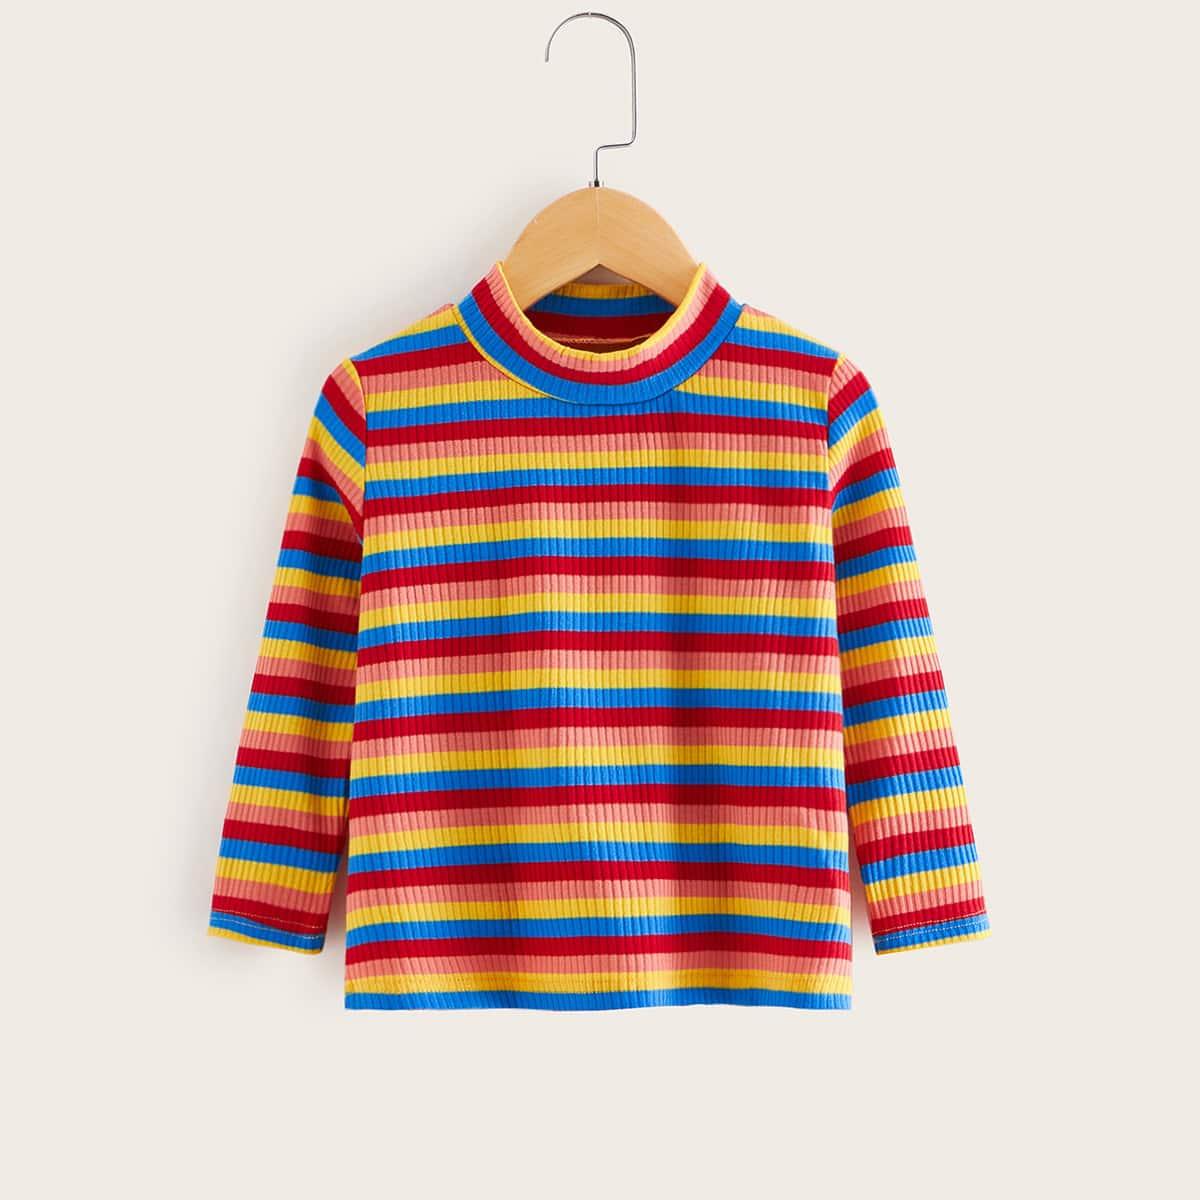 Veel kleurig Casual regenboog streep Shirts kleuters-meisjes Geplisseerde